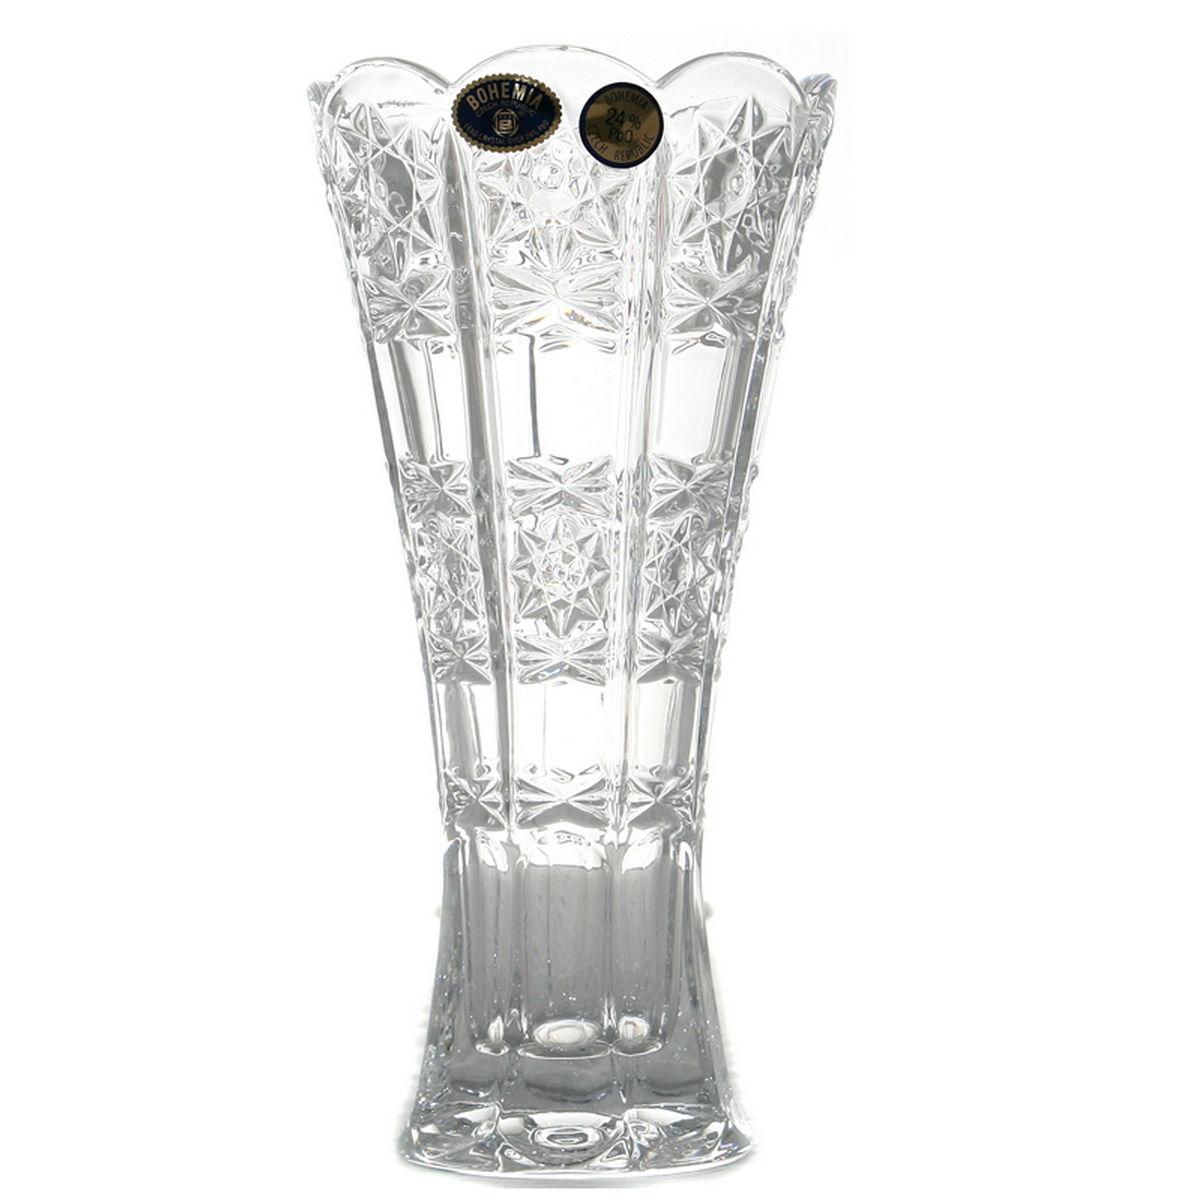 Vaza Cristal 20 Cm 2021 aranjareamesei.ro